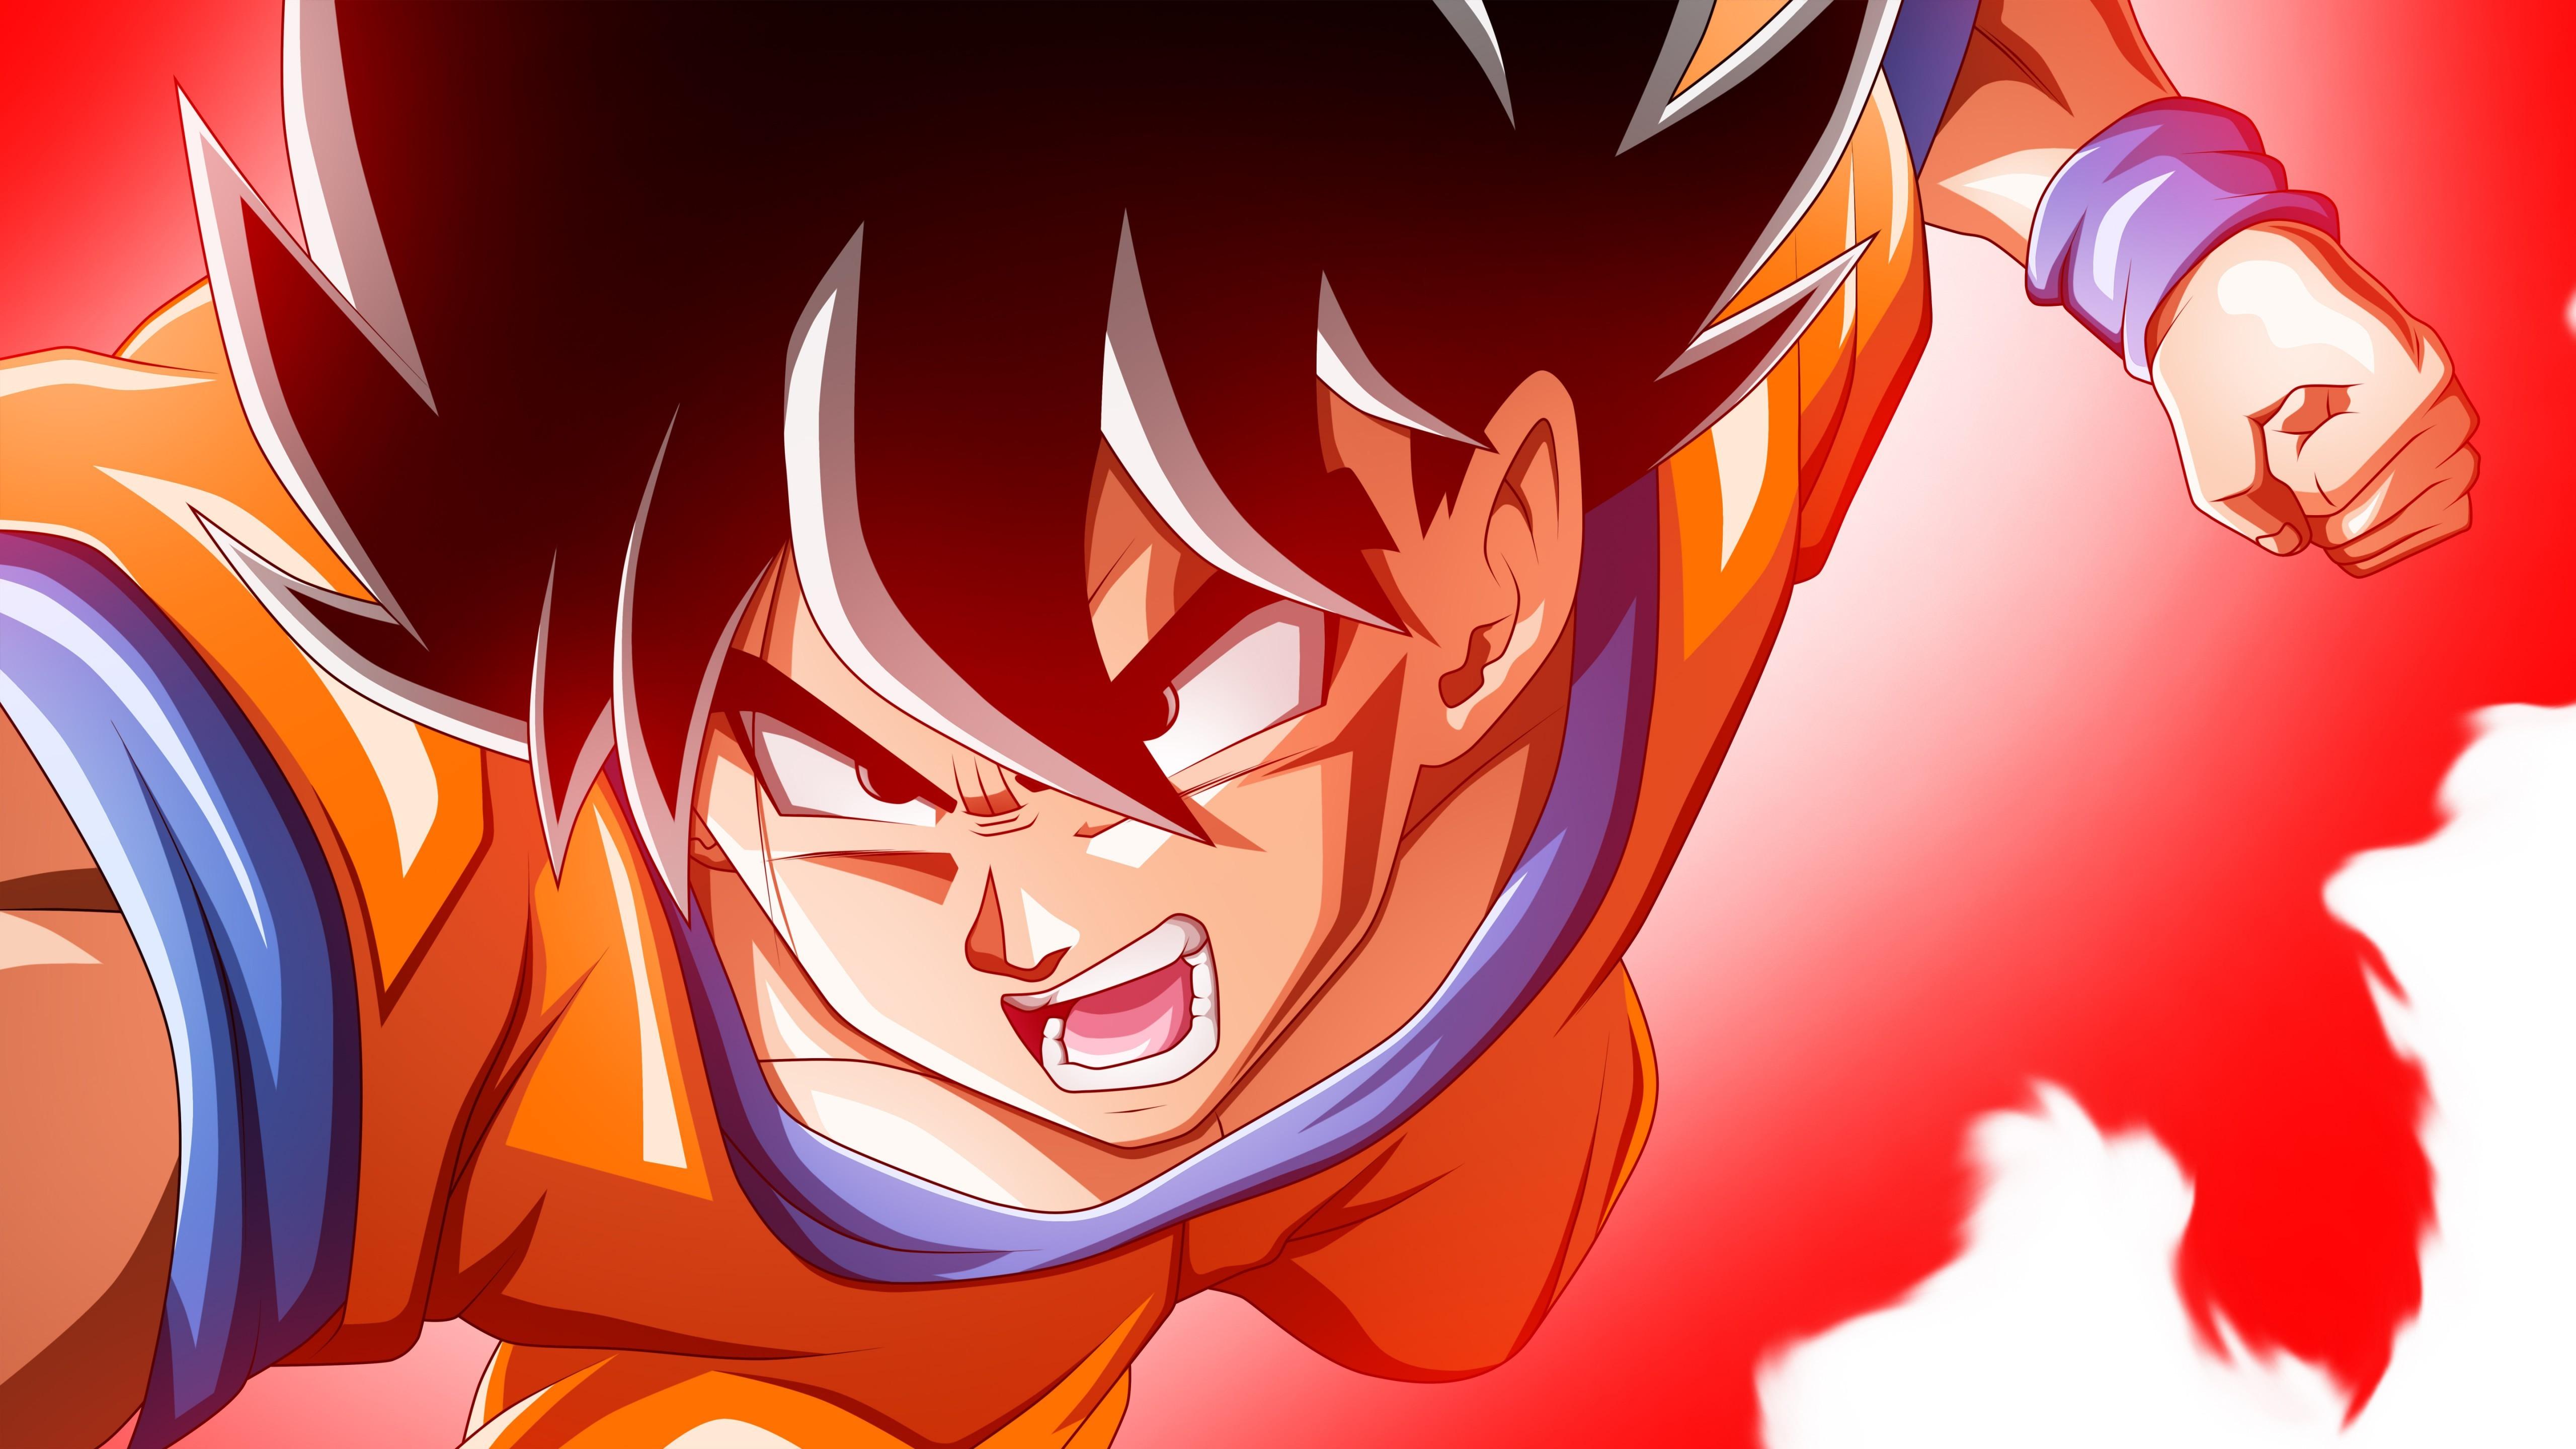 Goku 3d Wallpaper Download Son Goku Dragon Ball Super 5k Wallpapers Hd Wallpapers